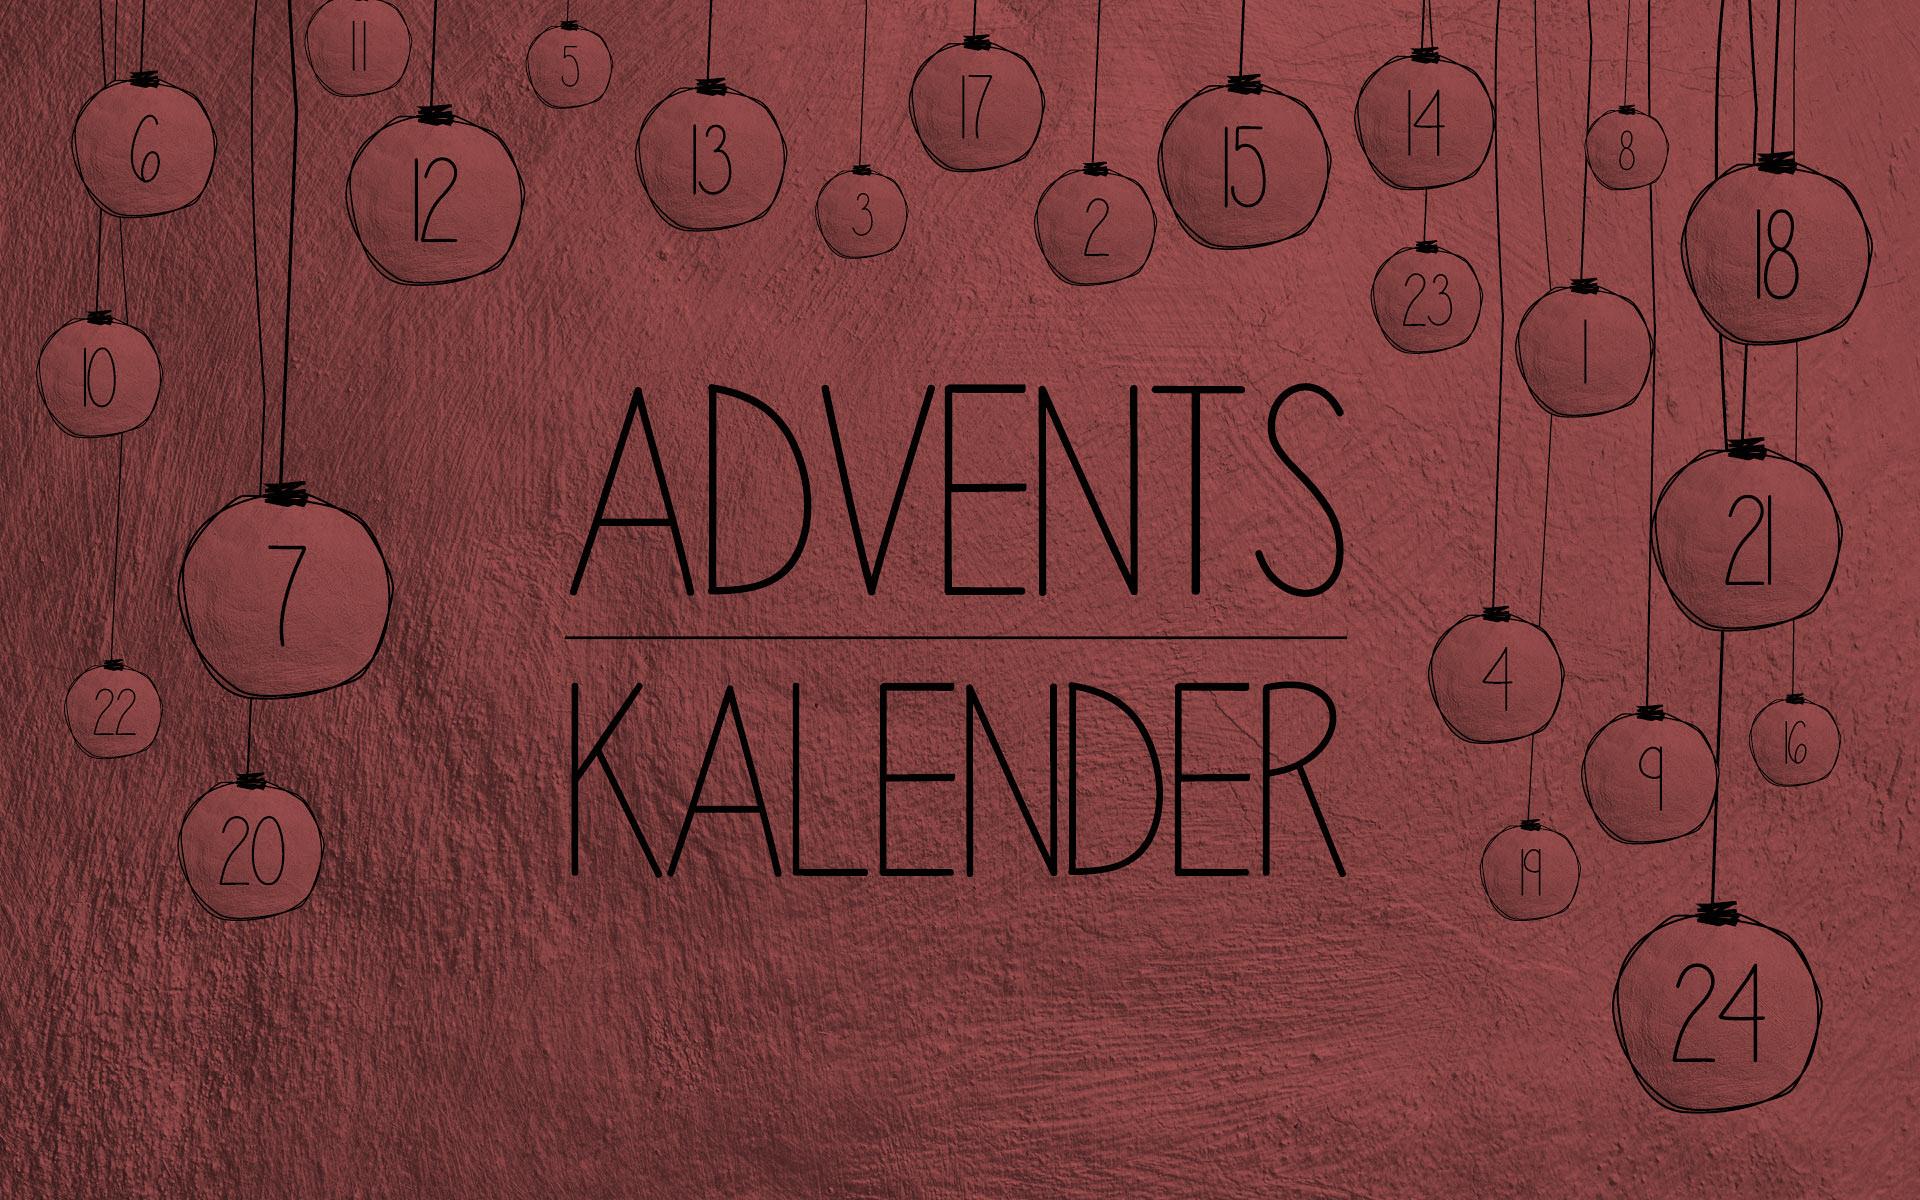 cosa-Adventskalender-Angebote: Woche 3